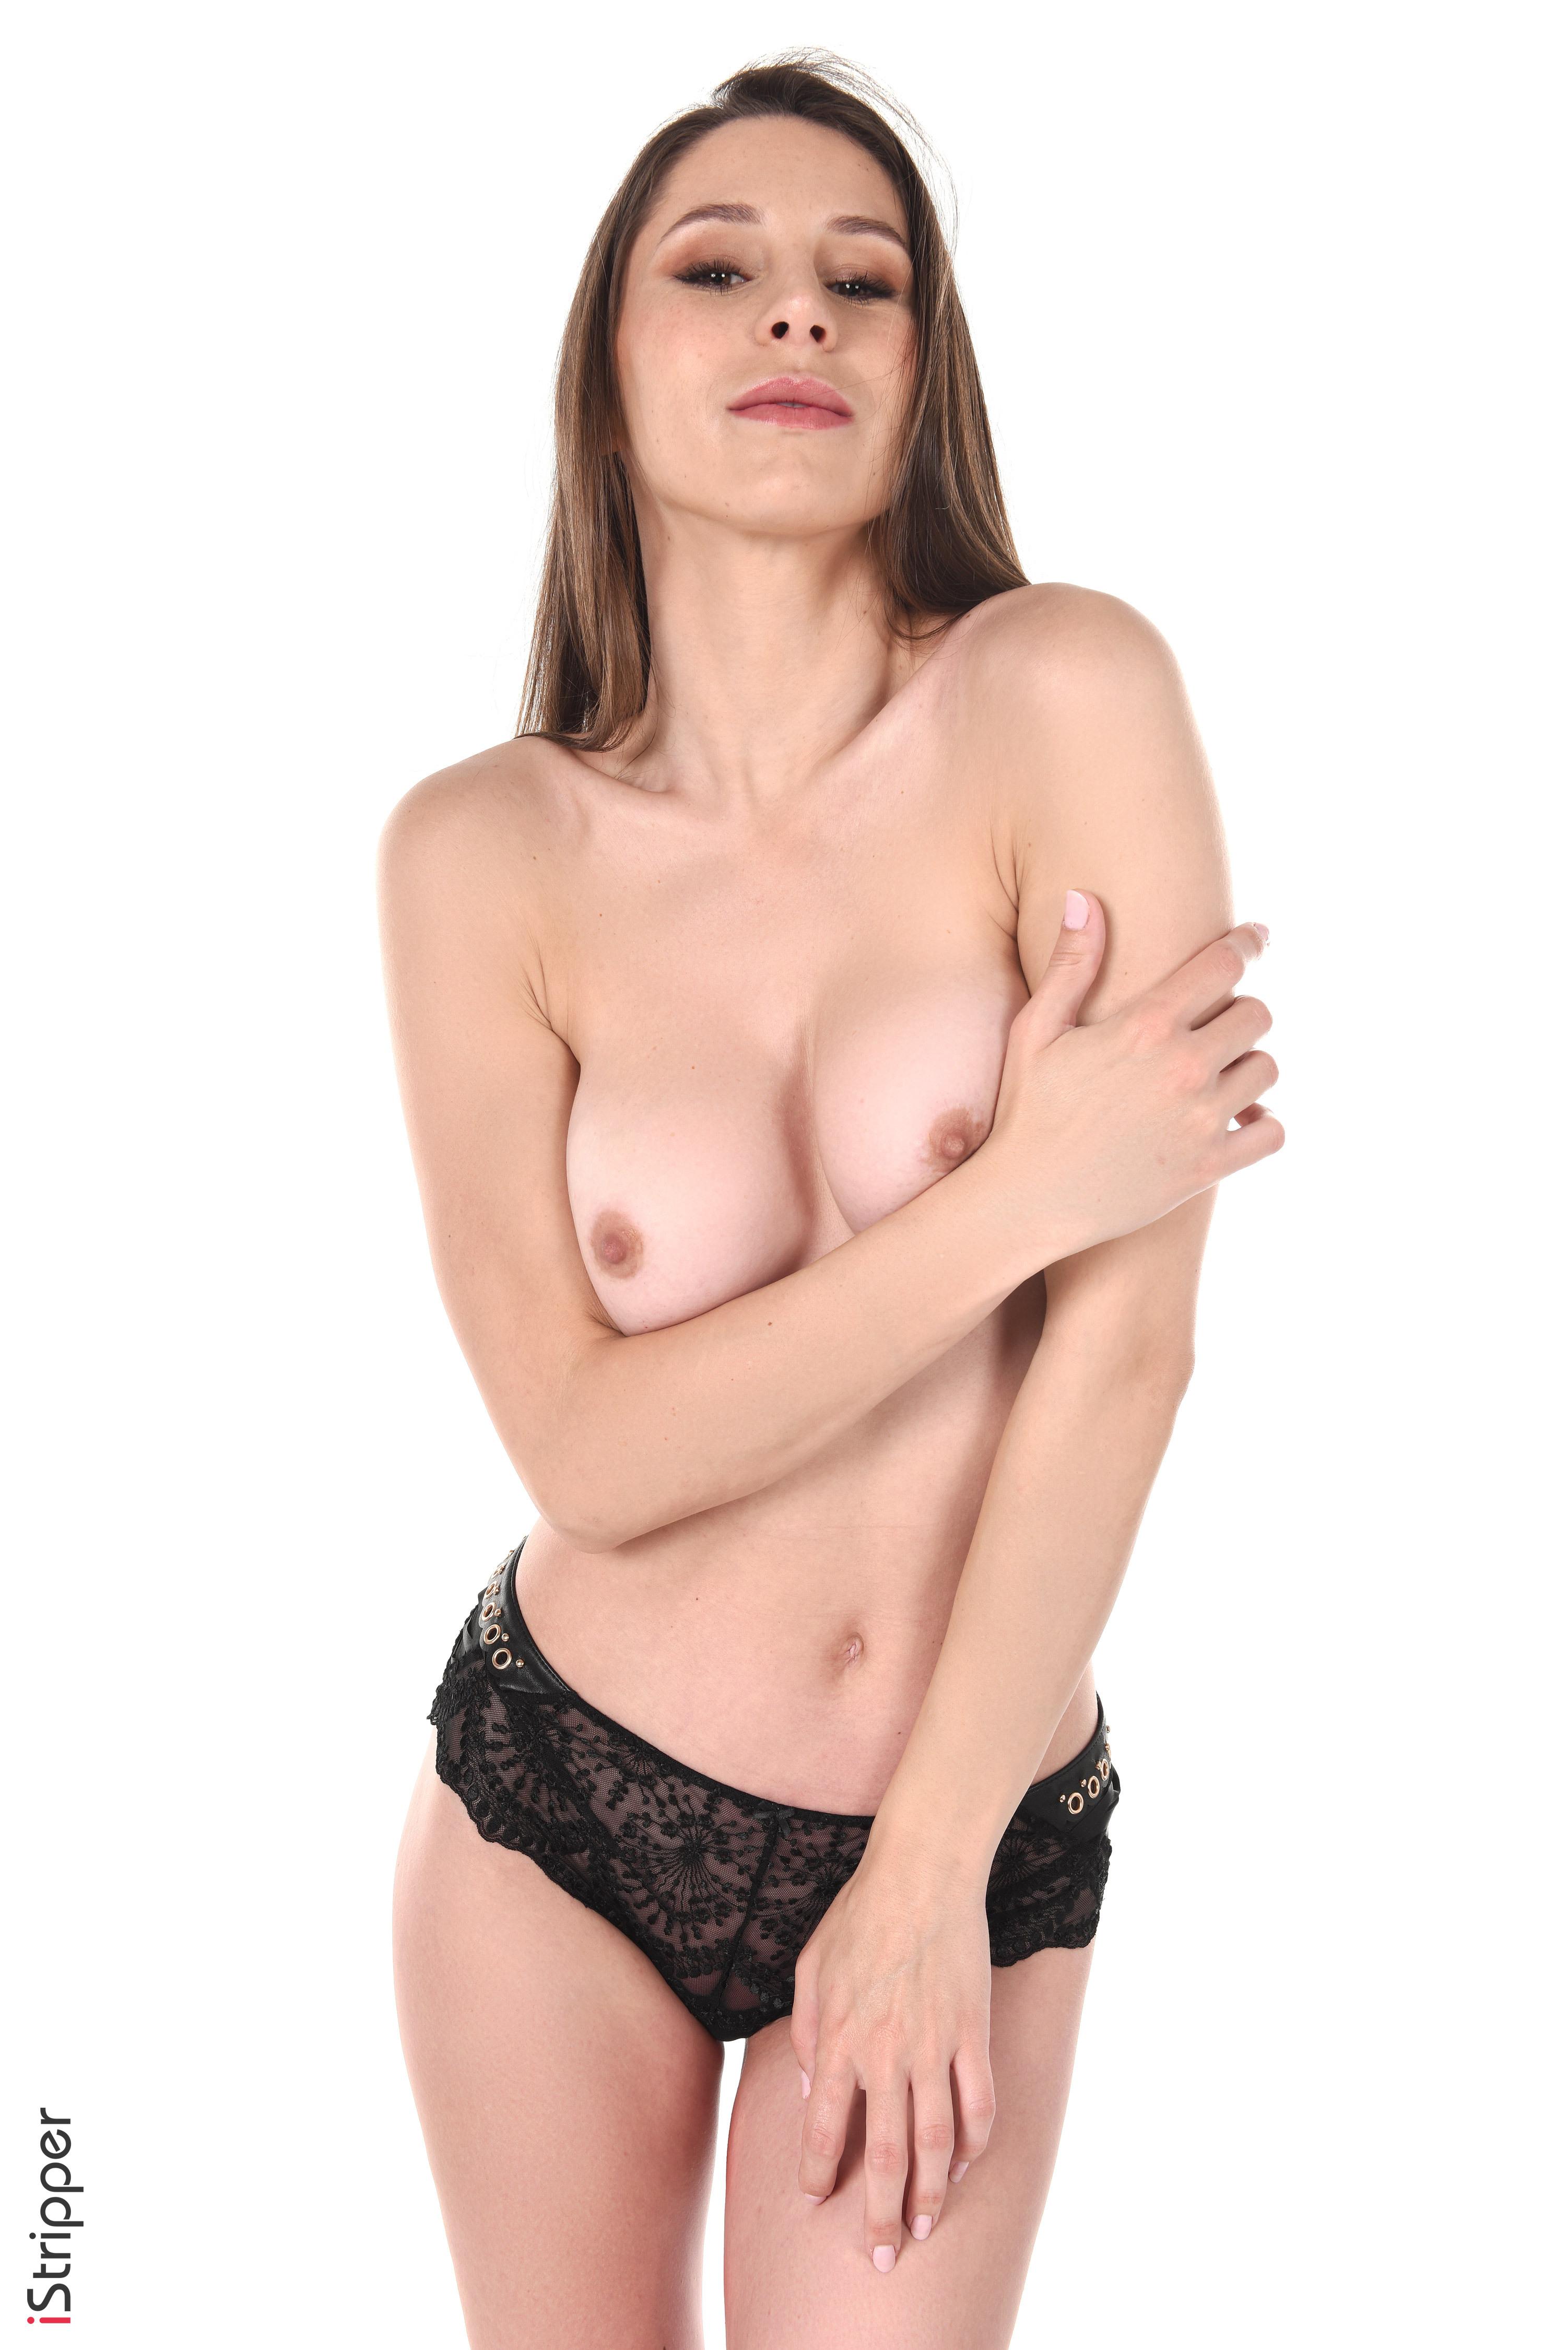 wallpaper girl sexy